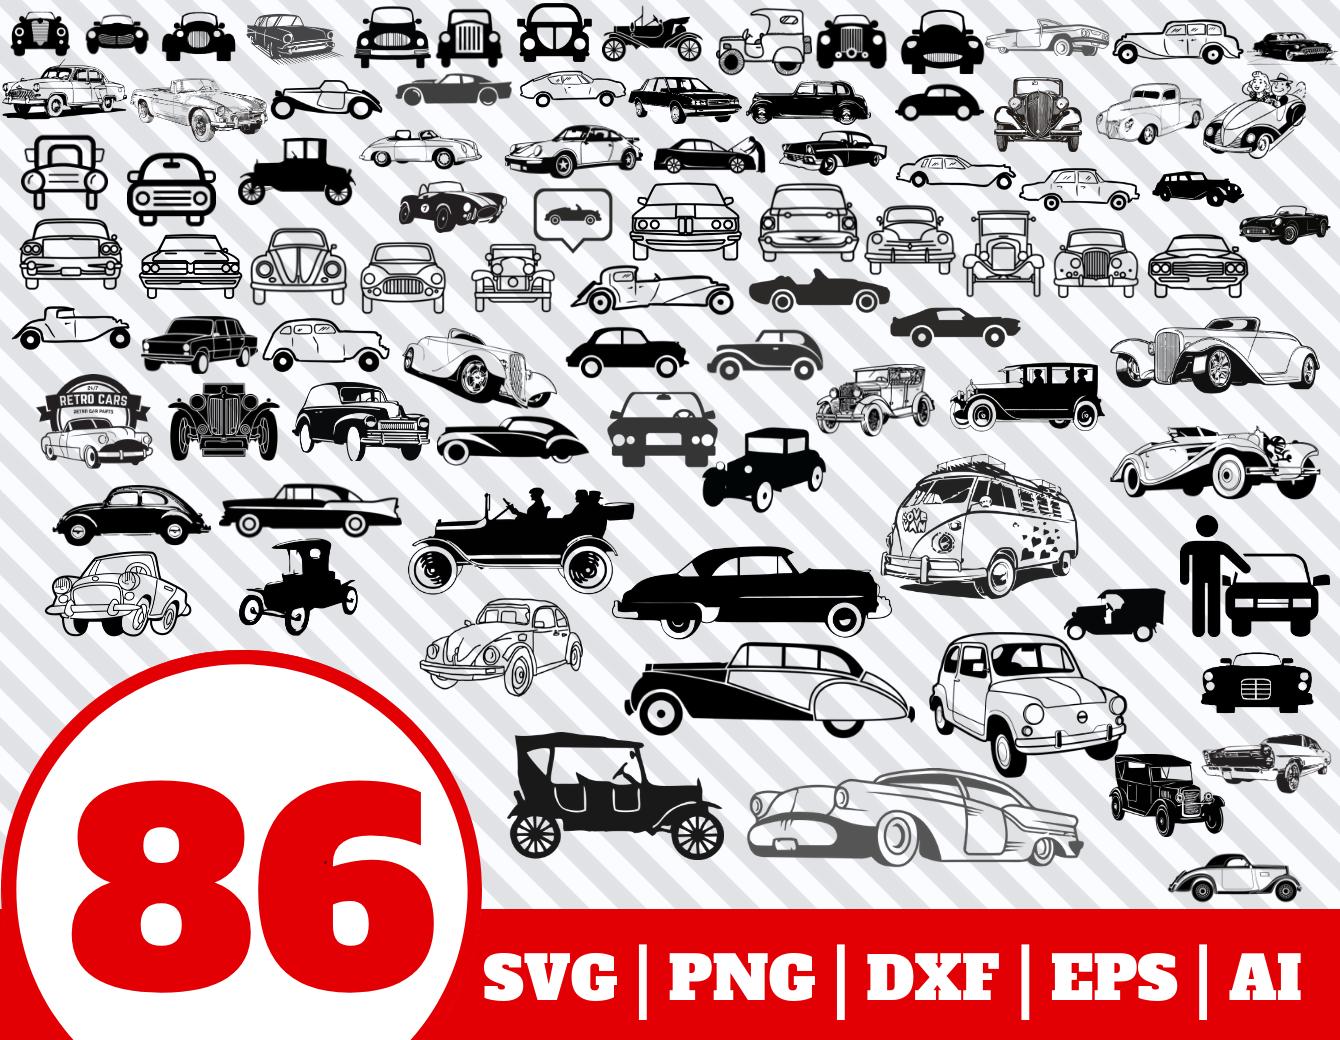 86 Vintage Car Svg Bundle Vintage Car Clipart Vintage Car